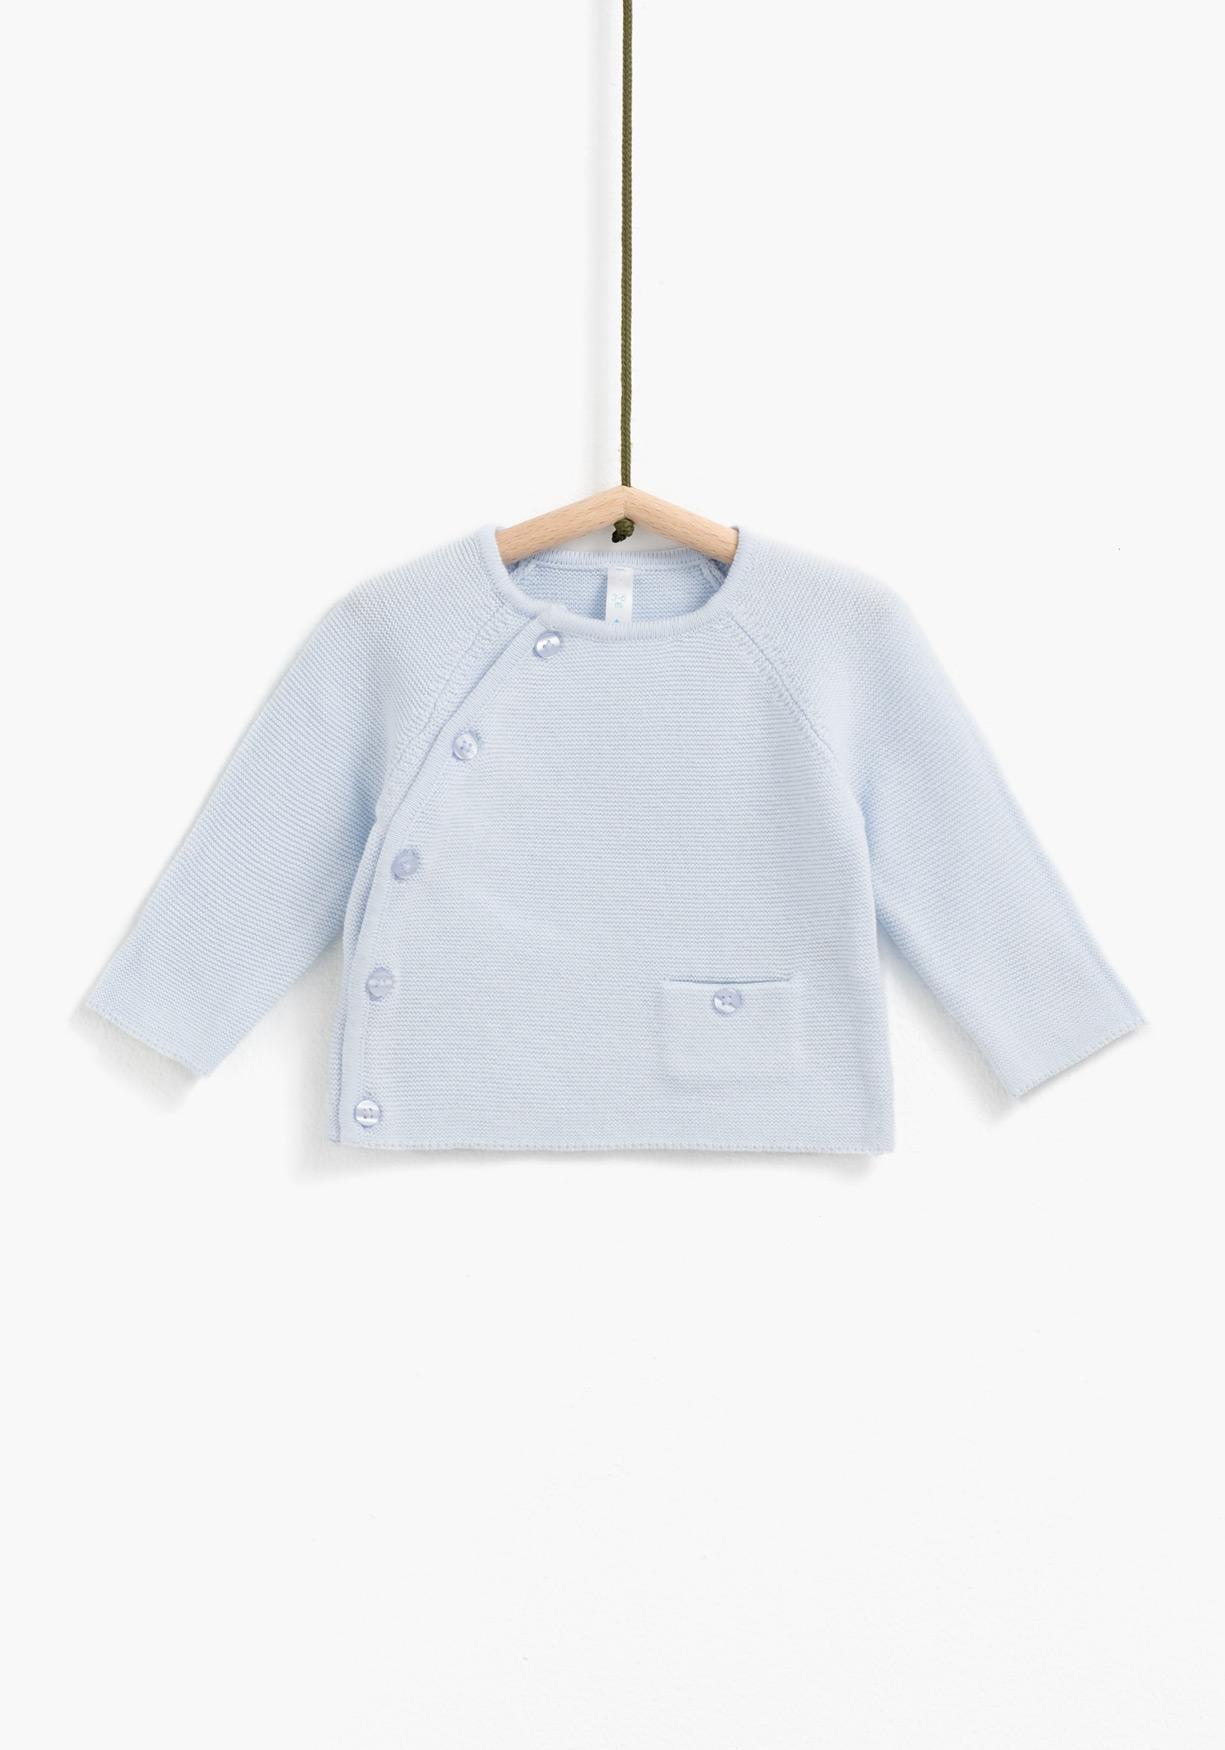 dbc8d4a6b Comprar Jersey con apertura lateral para recién nacido unisex TEX ...